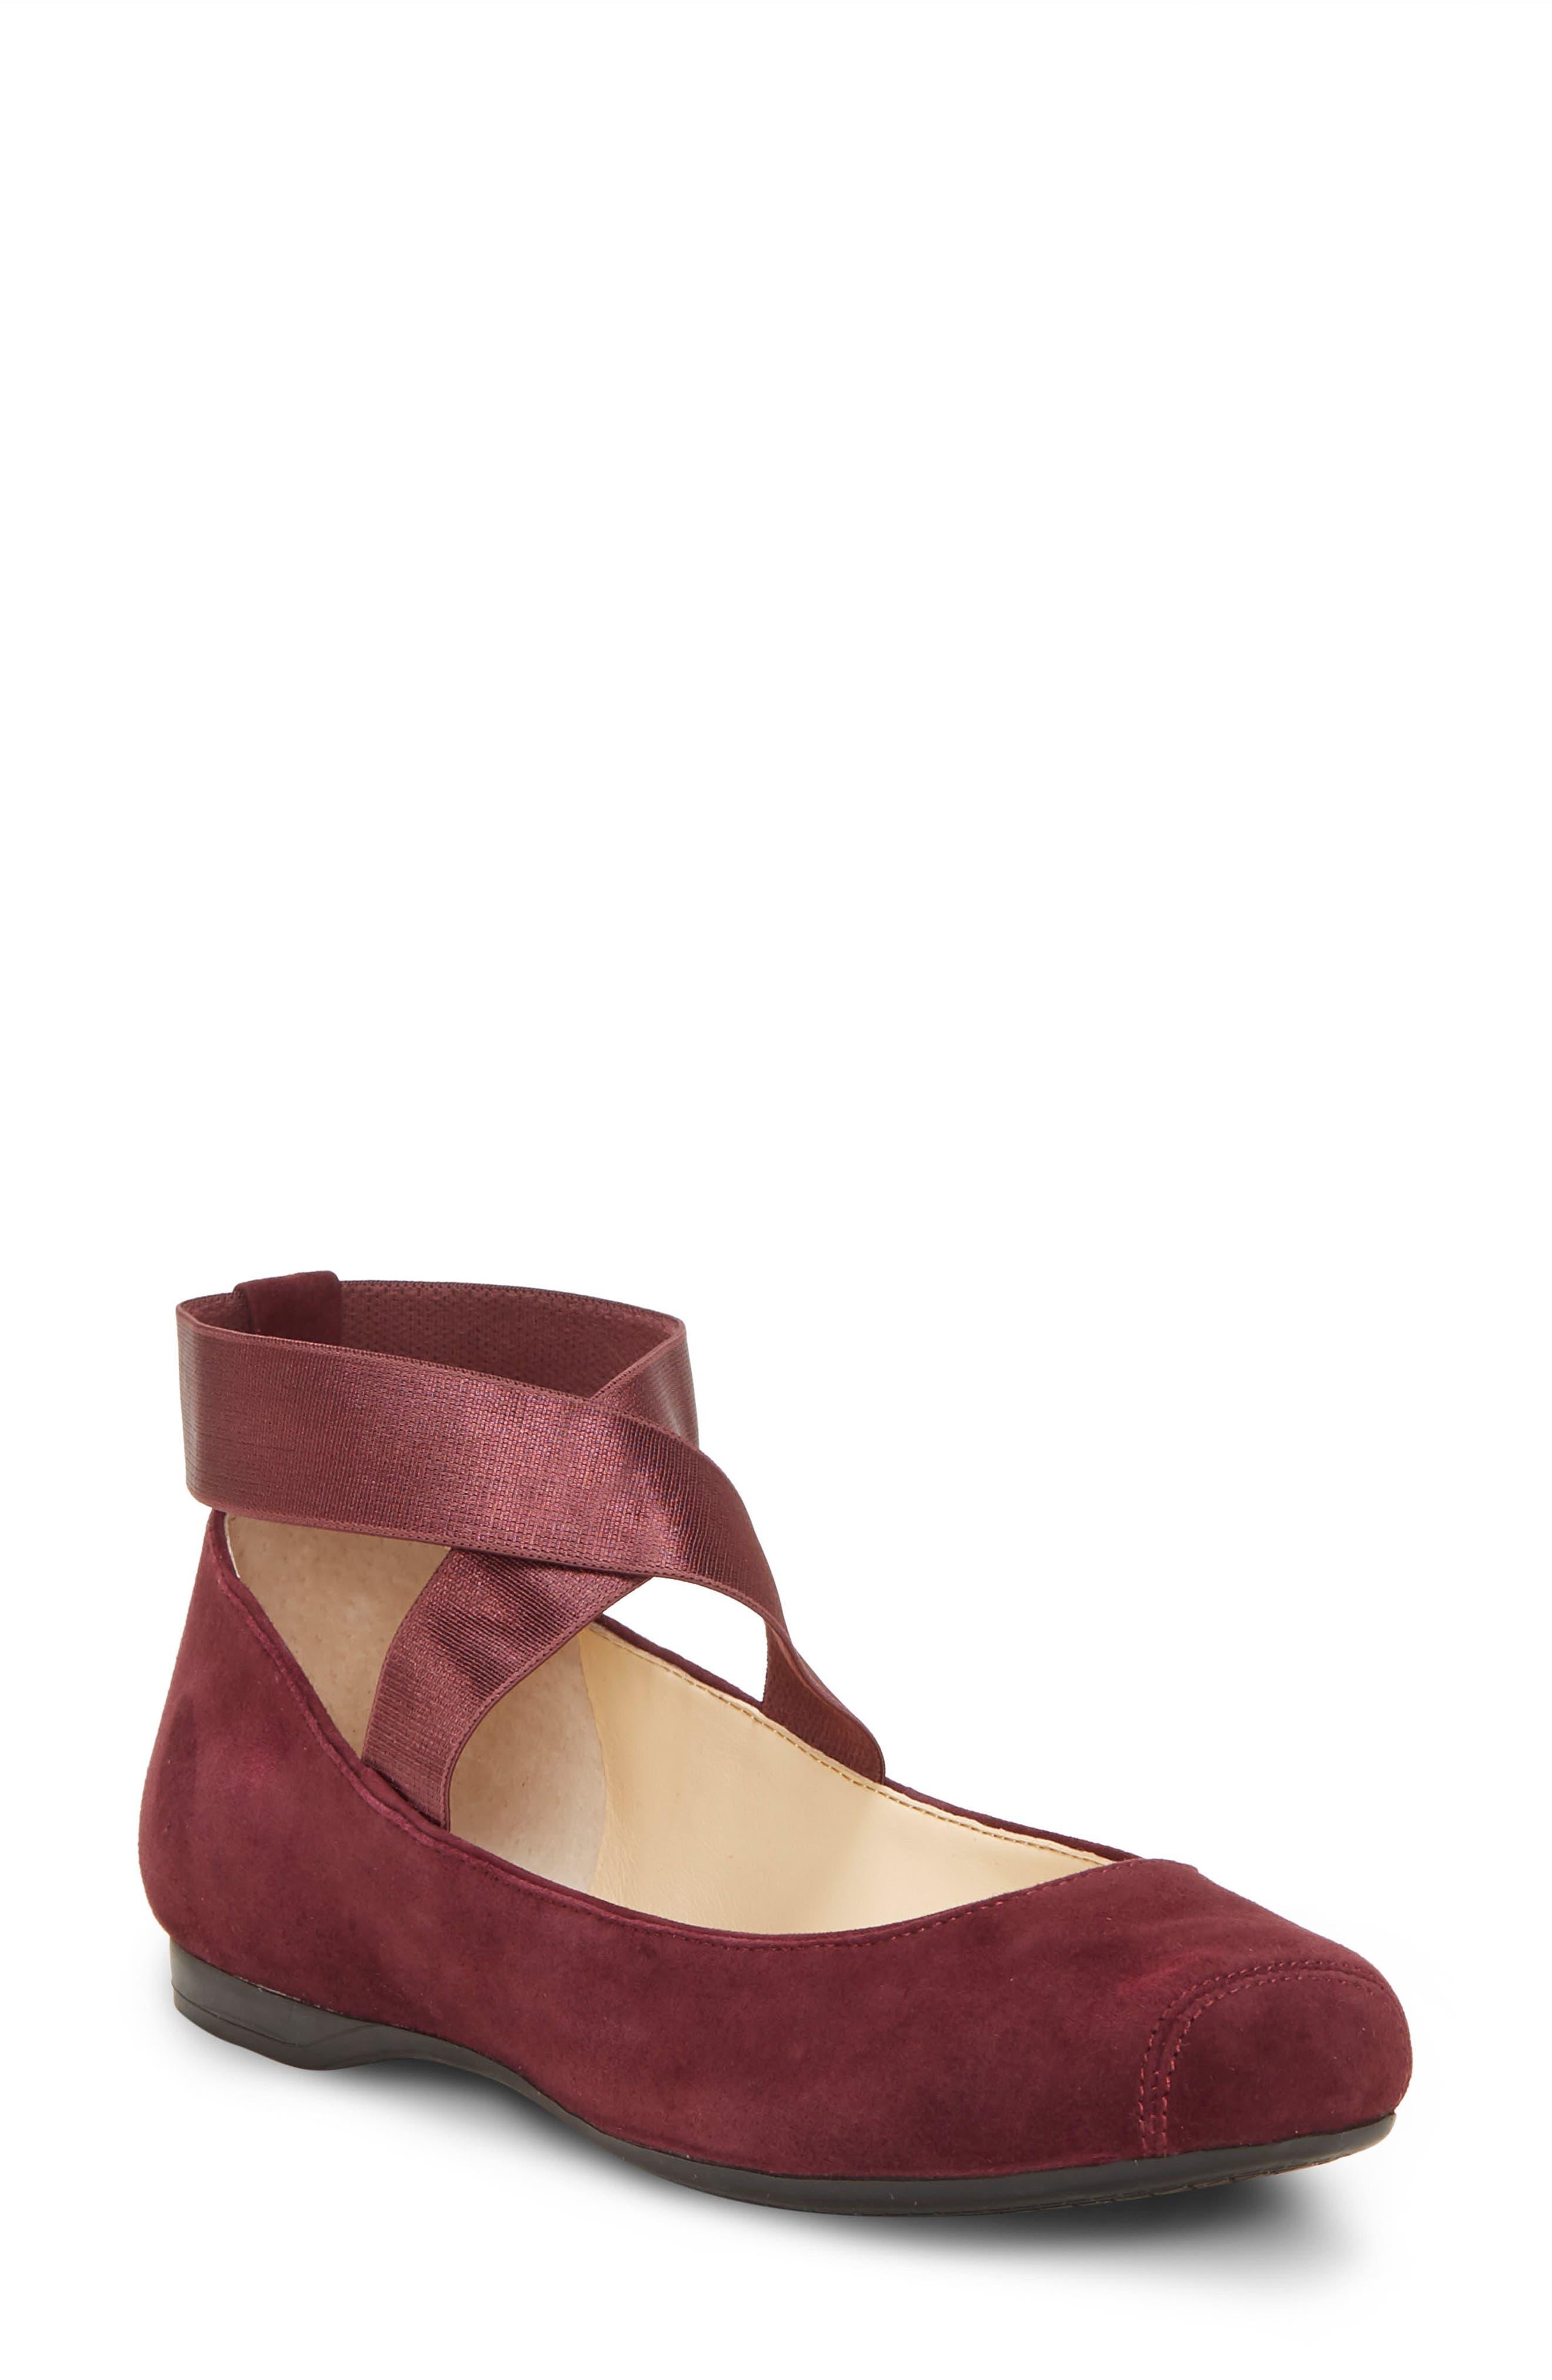 JESSICA SIMPSON 'Mandalaye' Leather Flat, Main, color, 501